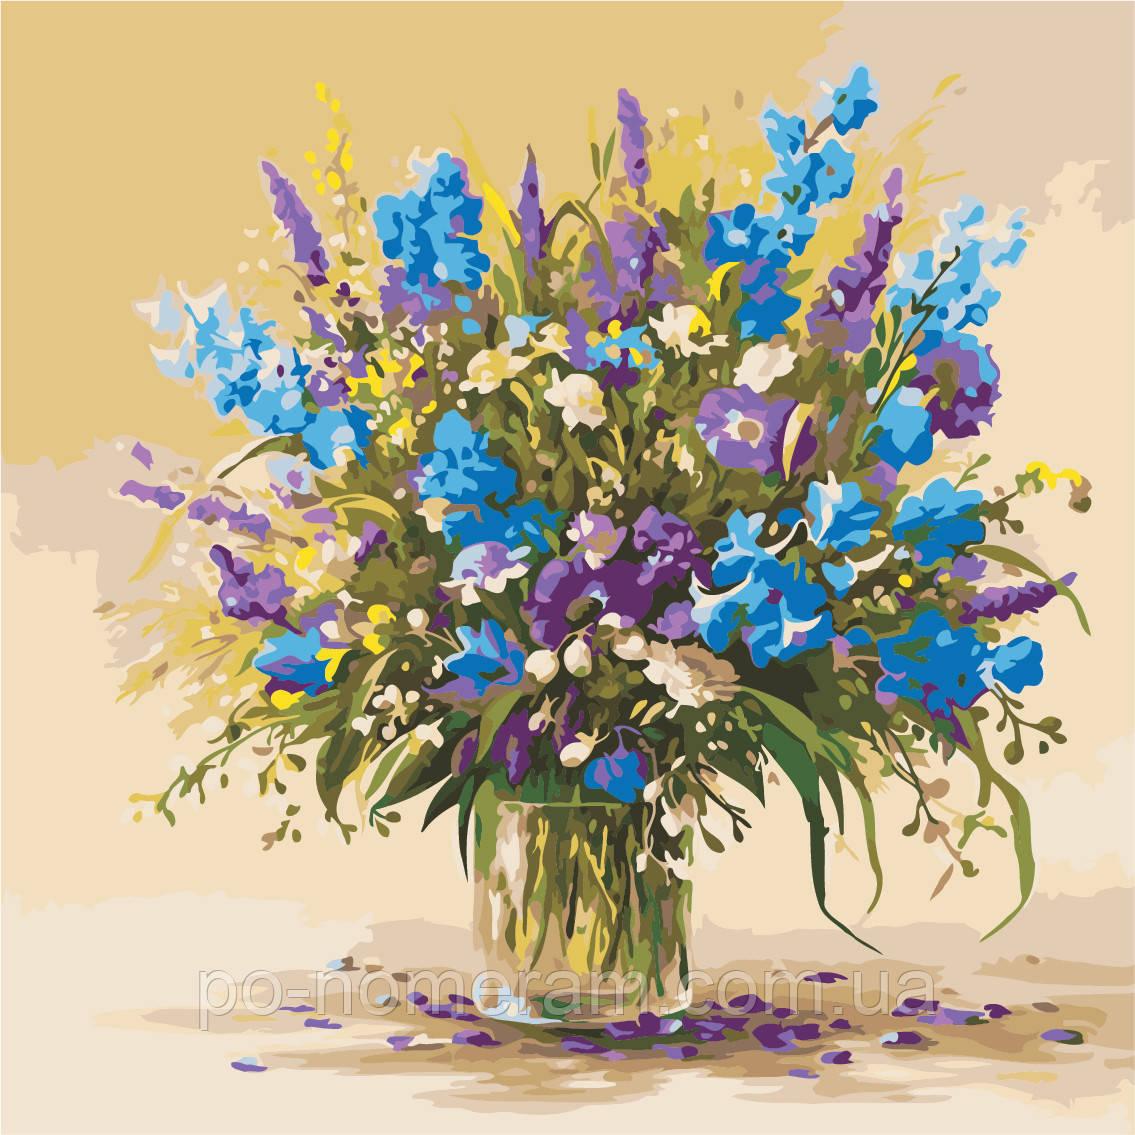 Картина по номерам ArtStory Букет полевых цветов (AS0945) 40 х 40 см (Без коробки)